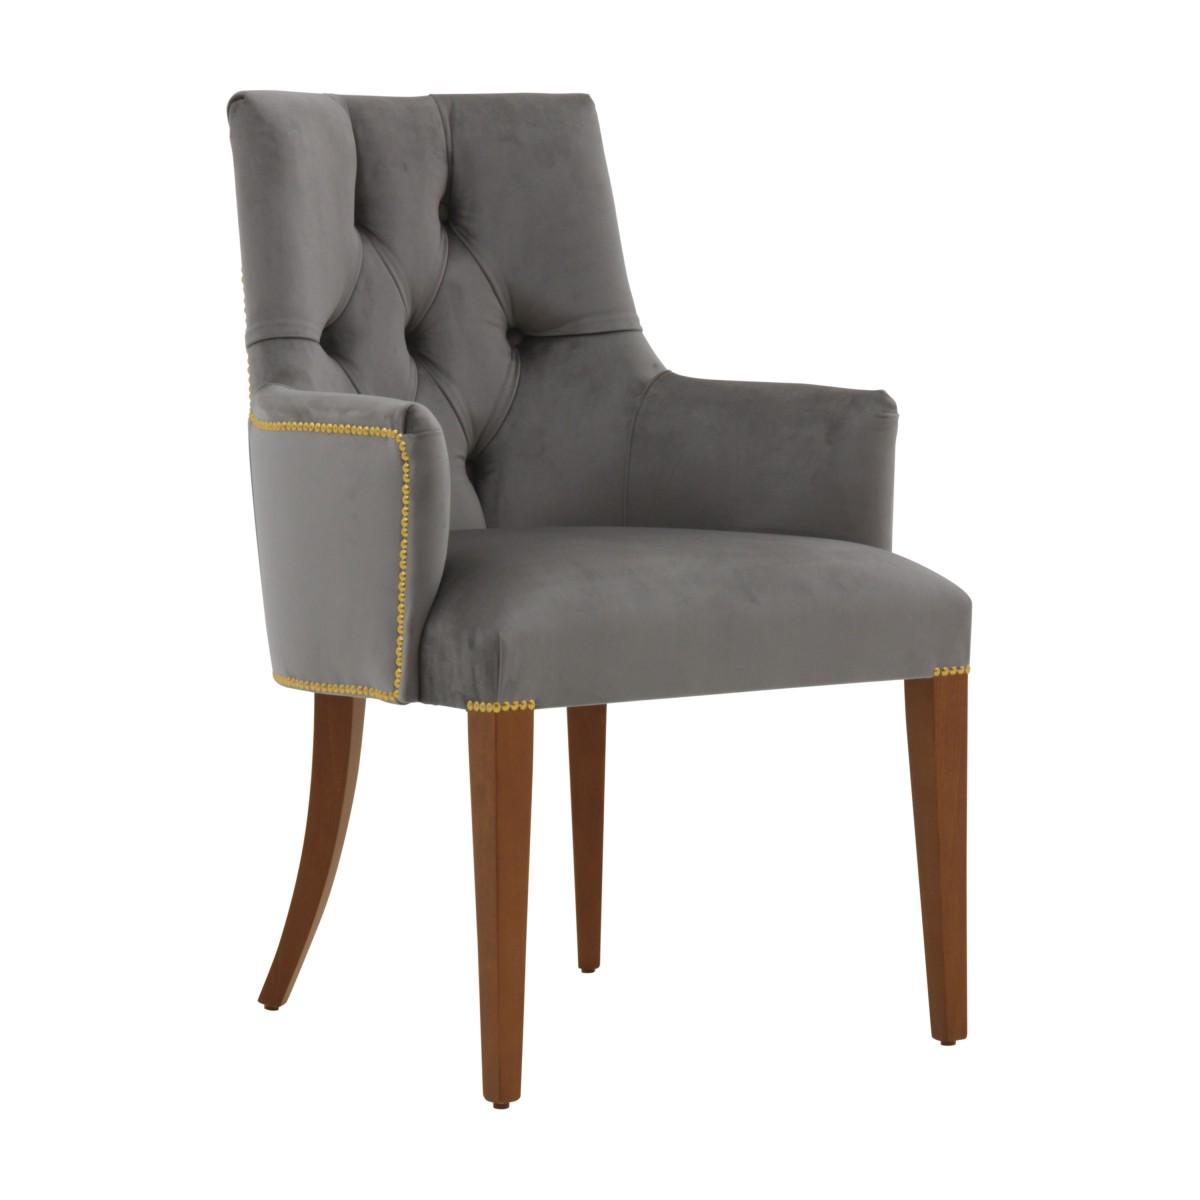 modern armchair olimpia 7563